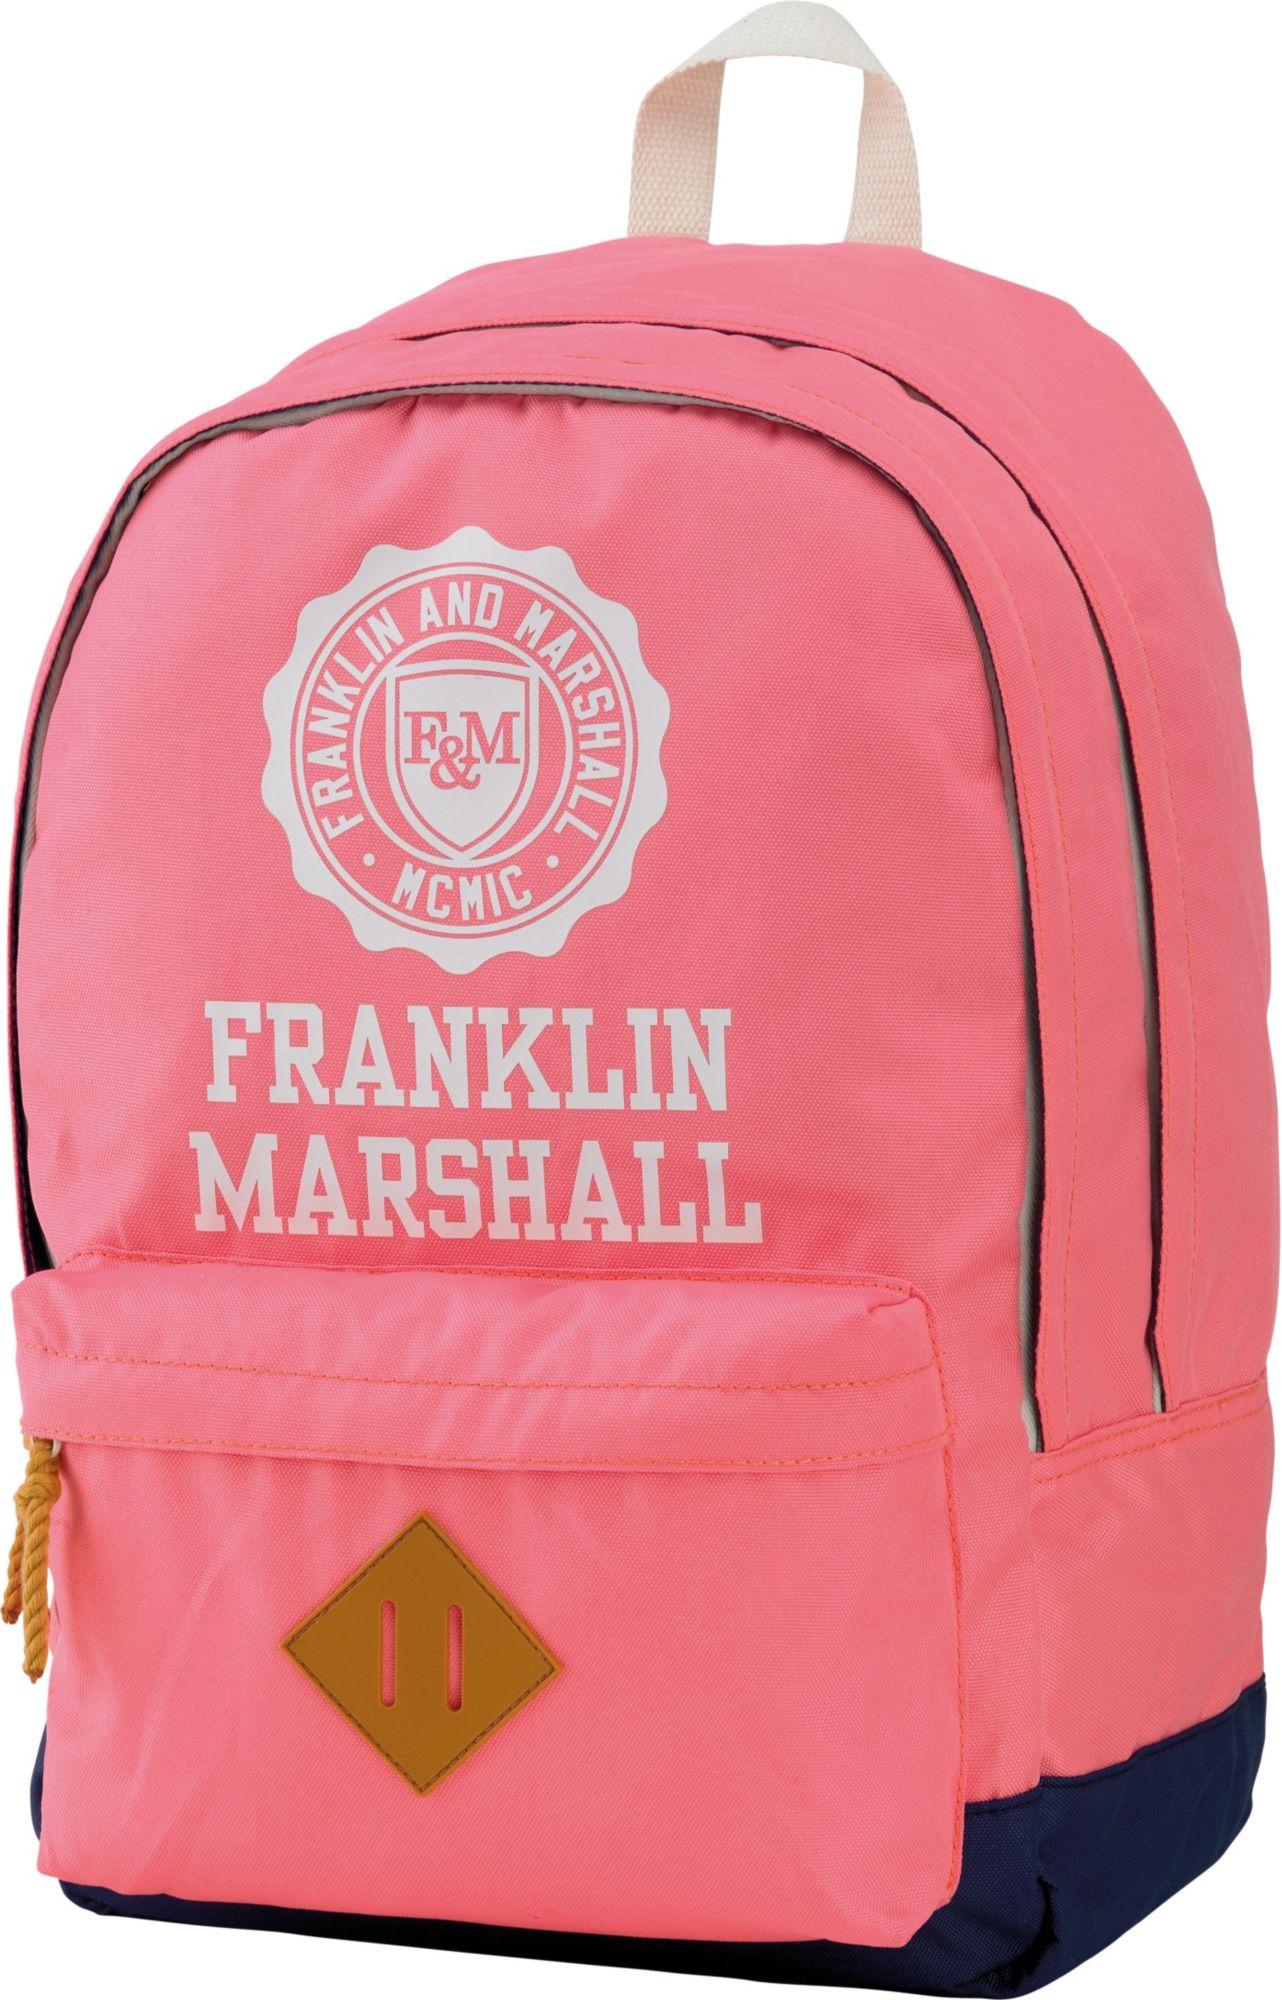 FRANKLIN MARSHALL Franklin & Marshall, Rucksack mit gummiertem Bodenschutz, »Girls Backpack rosa, Vol. 23 Liter«